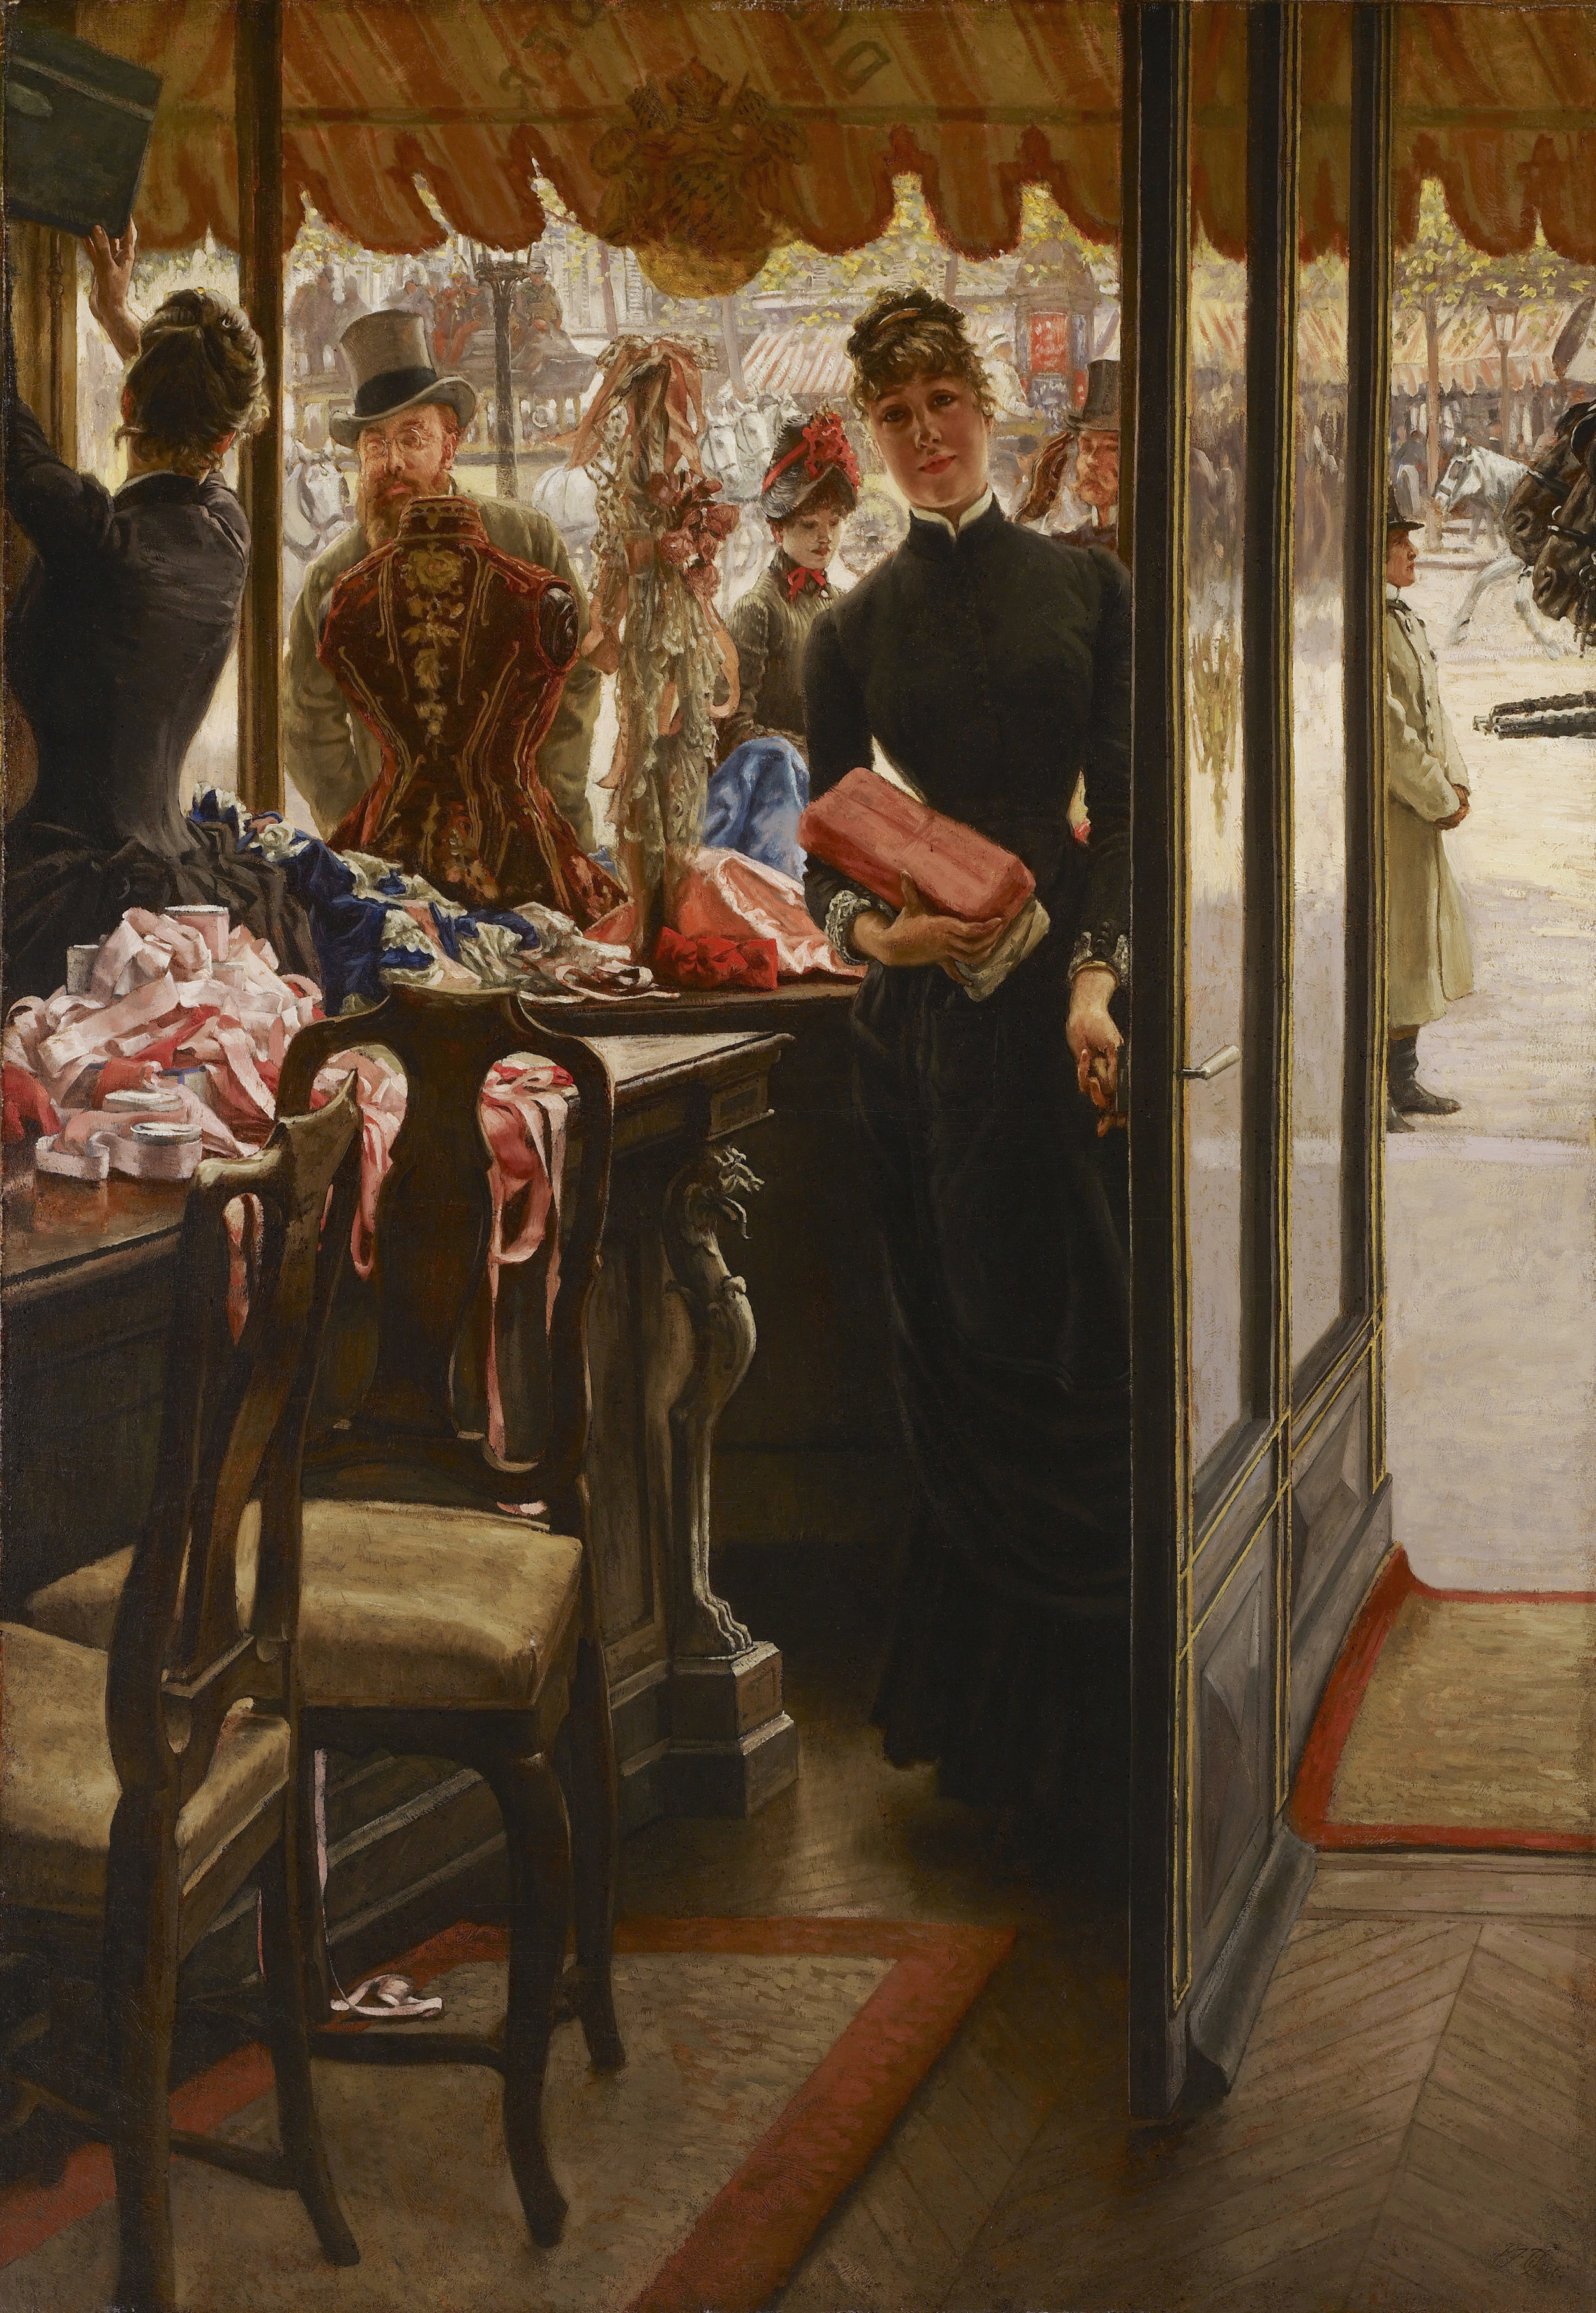 James Tissot, The Shop Girl